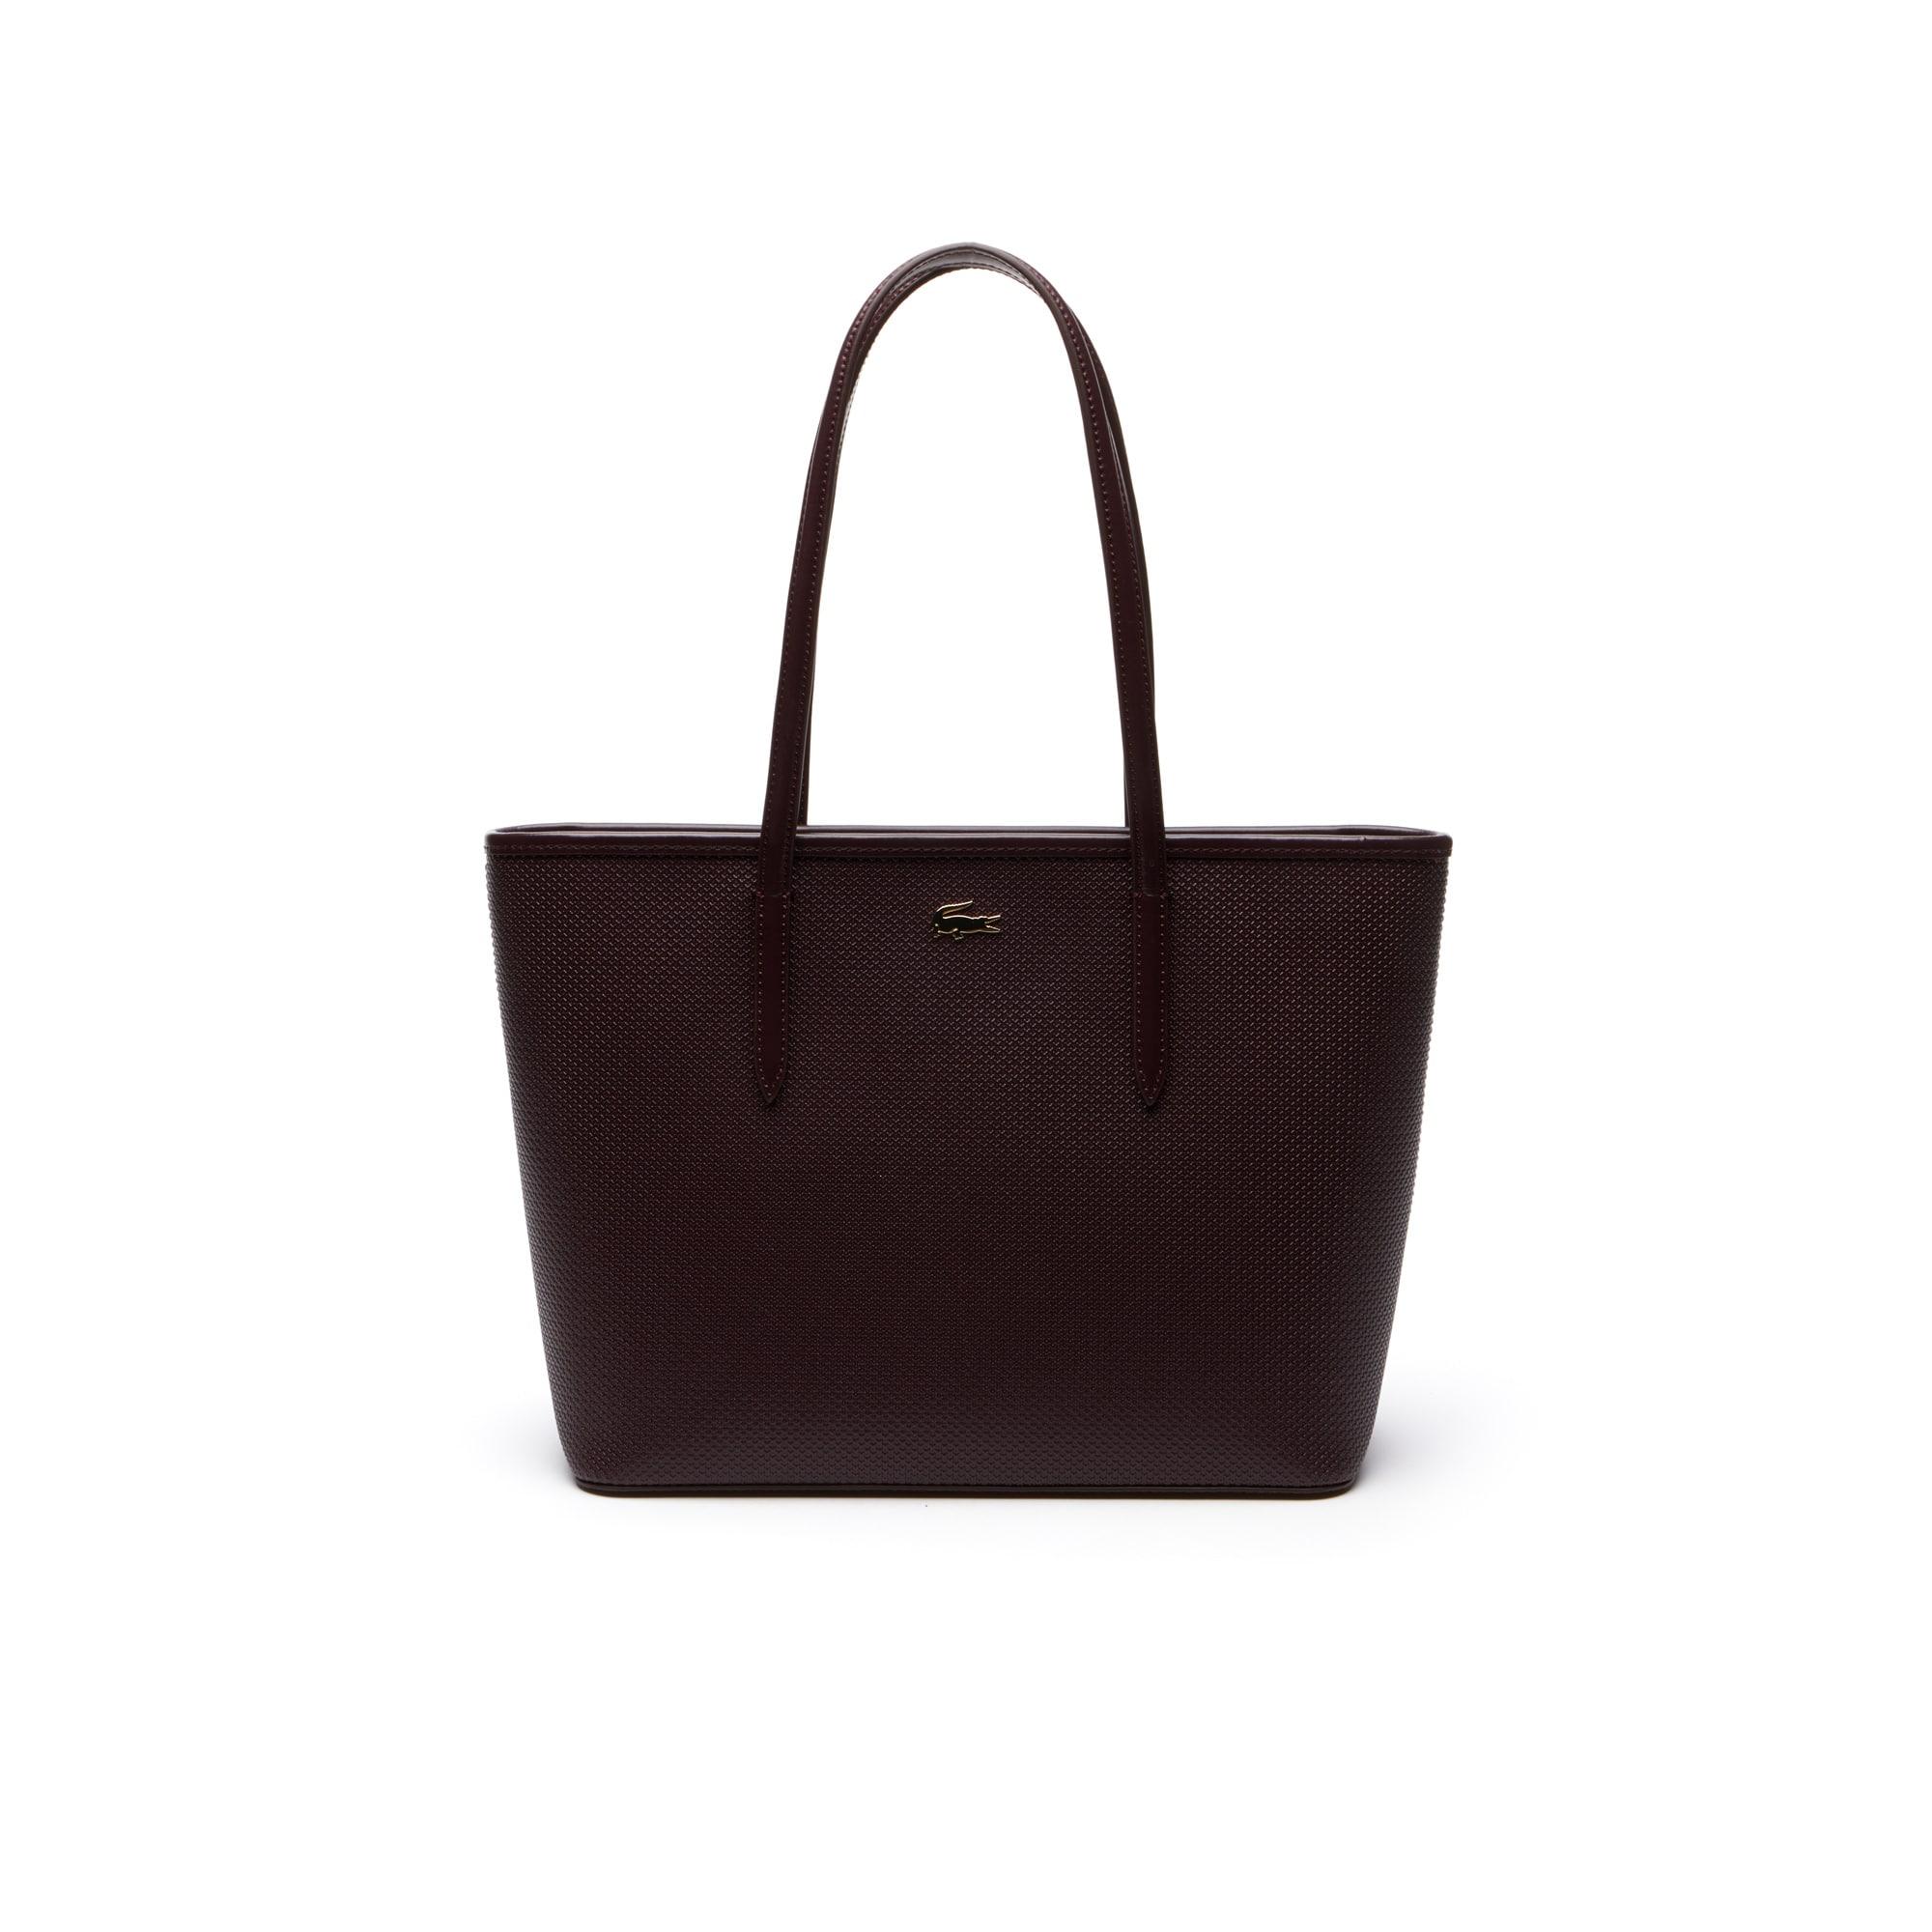 Women's Chantaco Zippered Piqué Leather Tote Bag